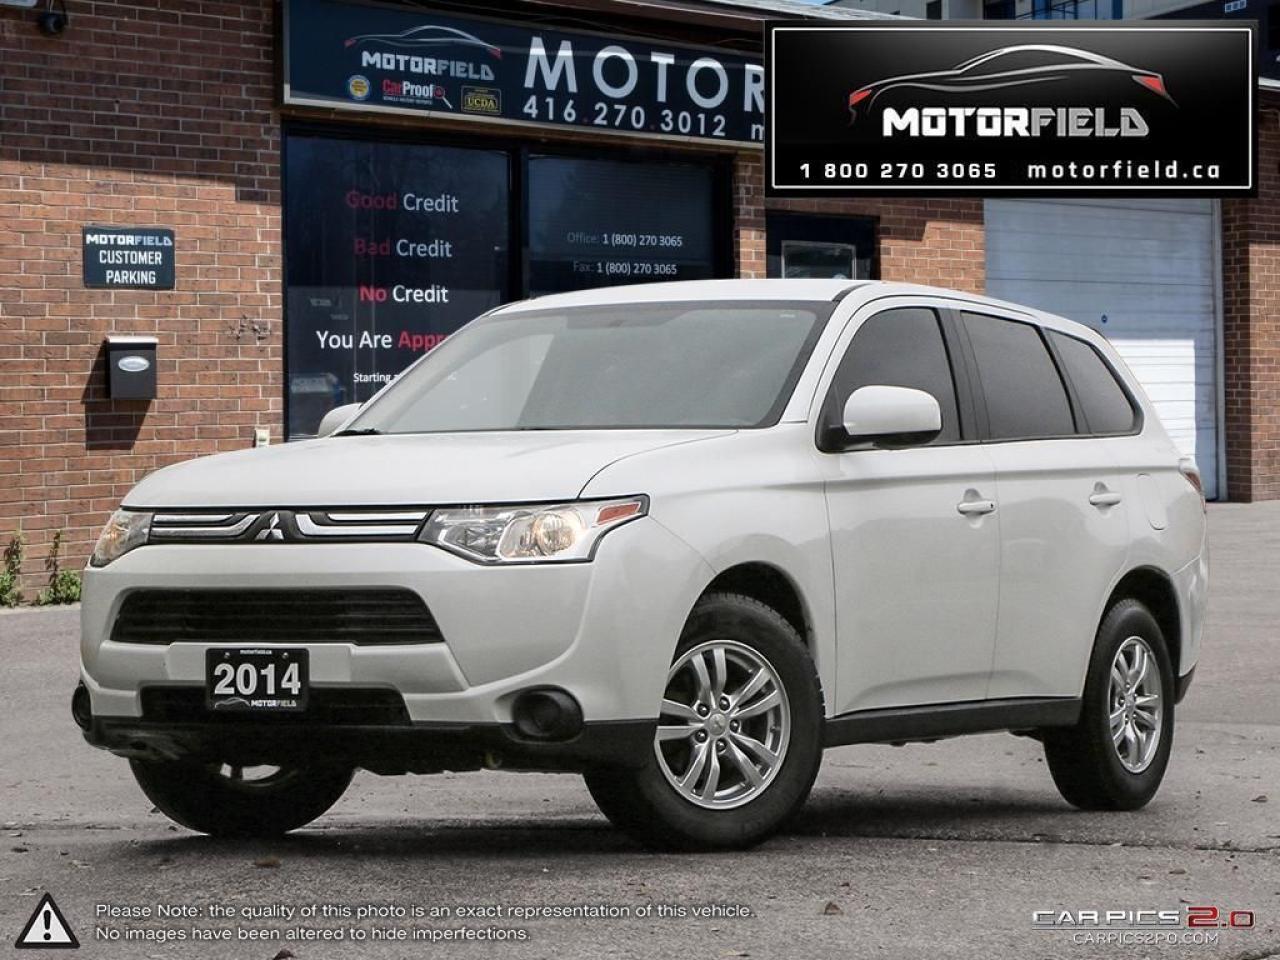 2014 Mitsubishi Outlander ES FWD *Factory Warranty, Rearview Cam, Certified*